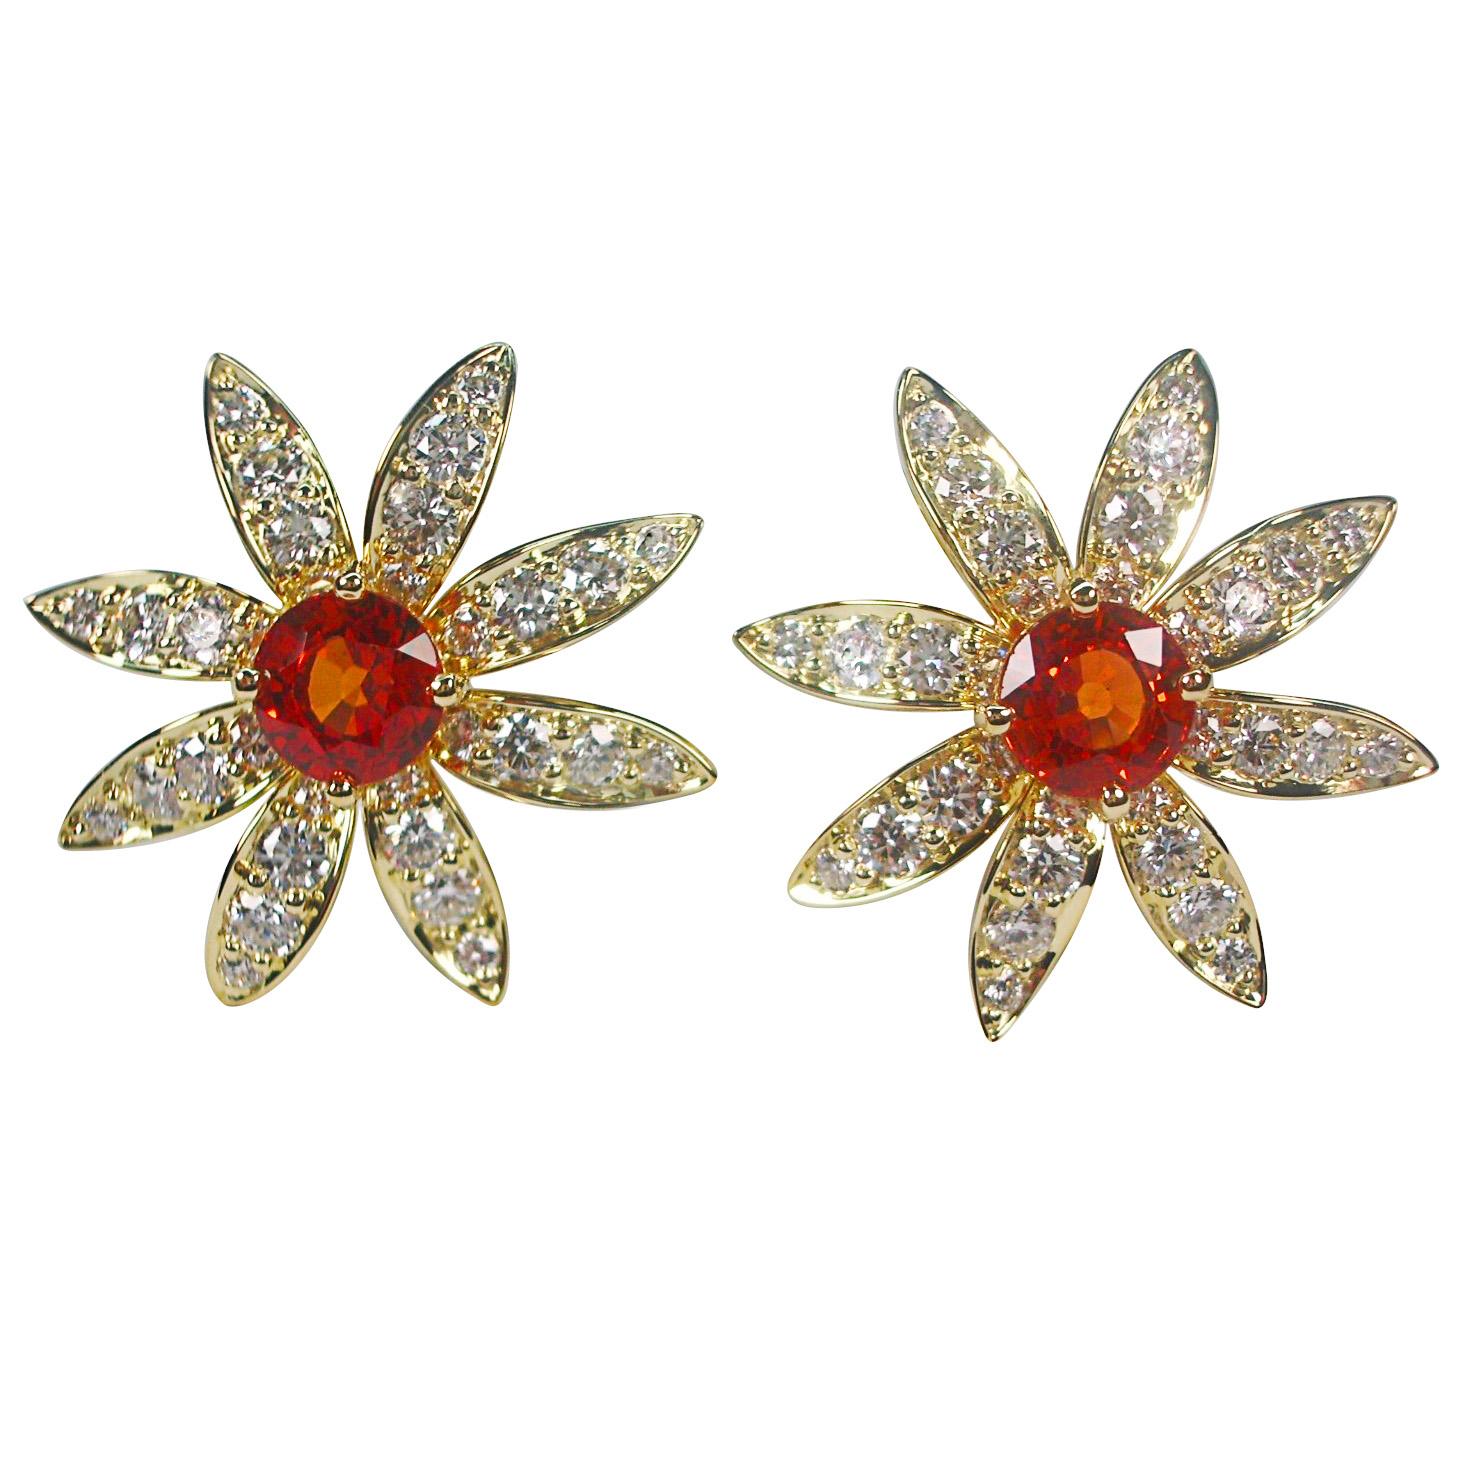 Flower Earrings Mandarin garnets fine quality diamonds 18K yellow gold